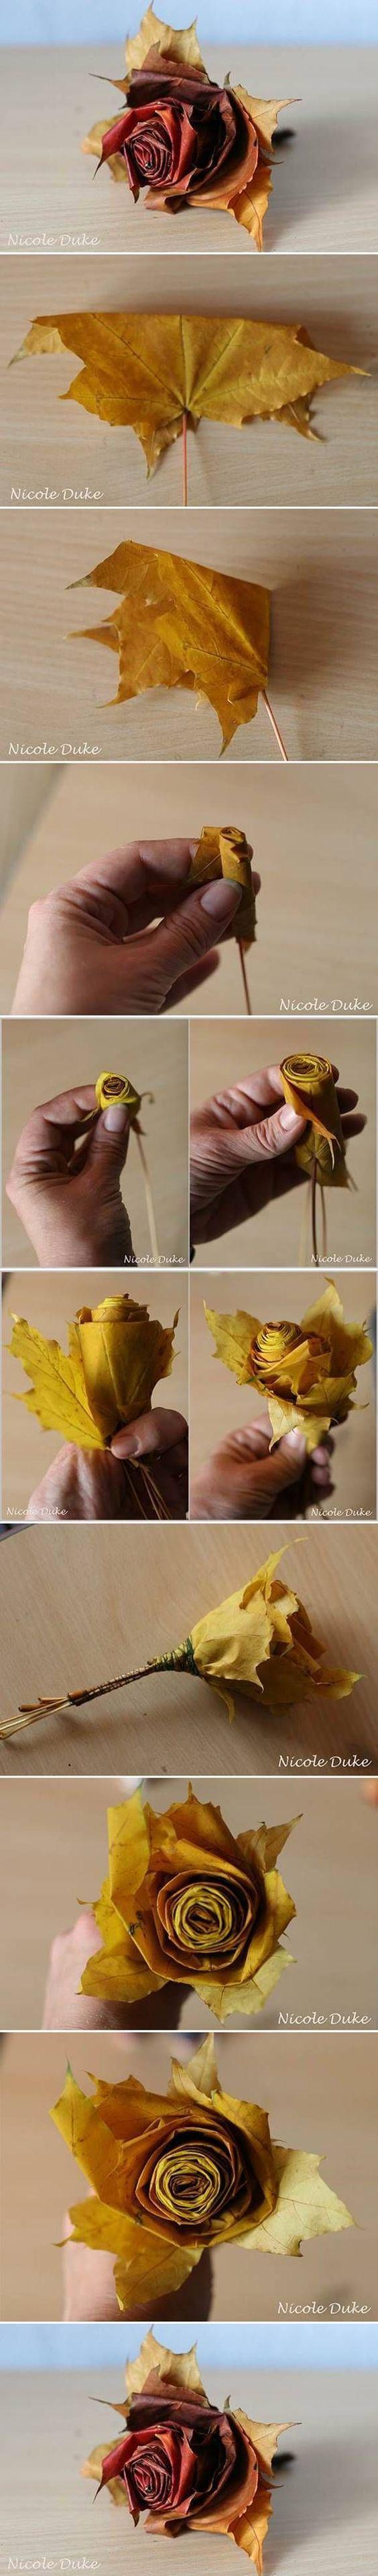 How to Make Beautiful Maple Leaf Rose #craft #leaf #decorating: